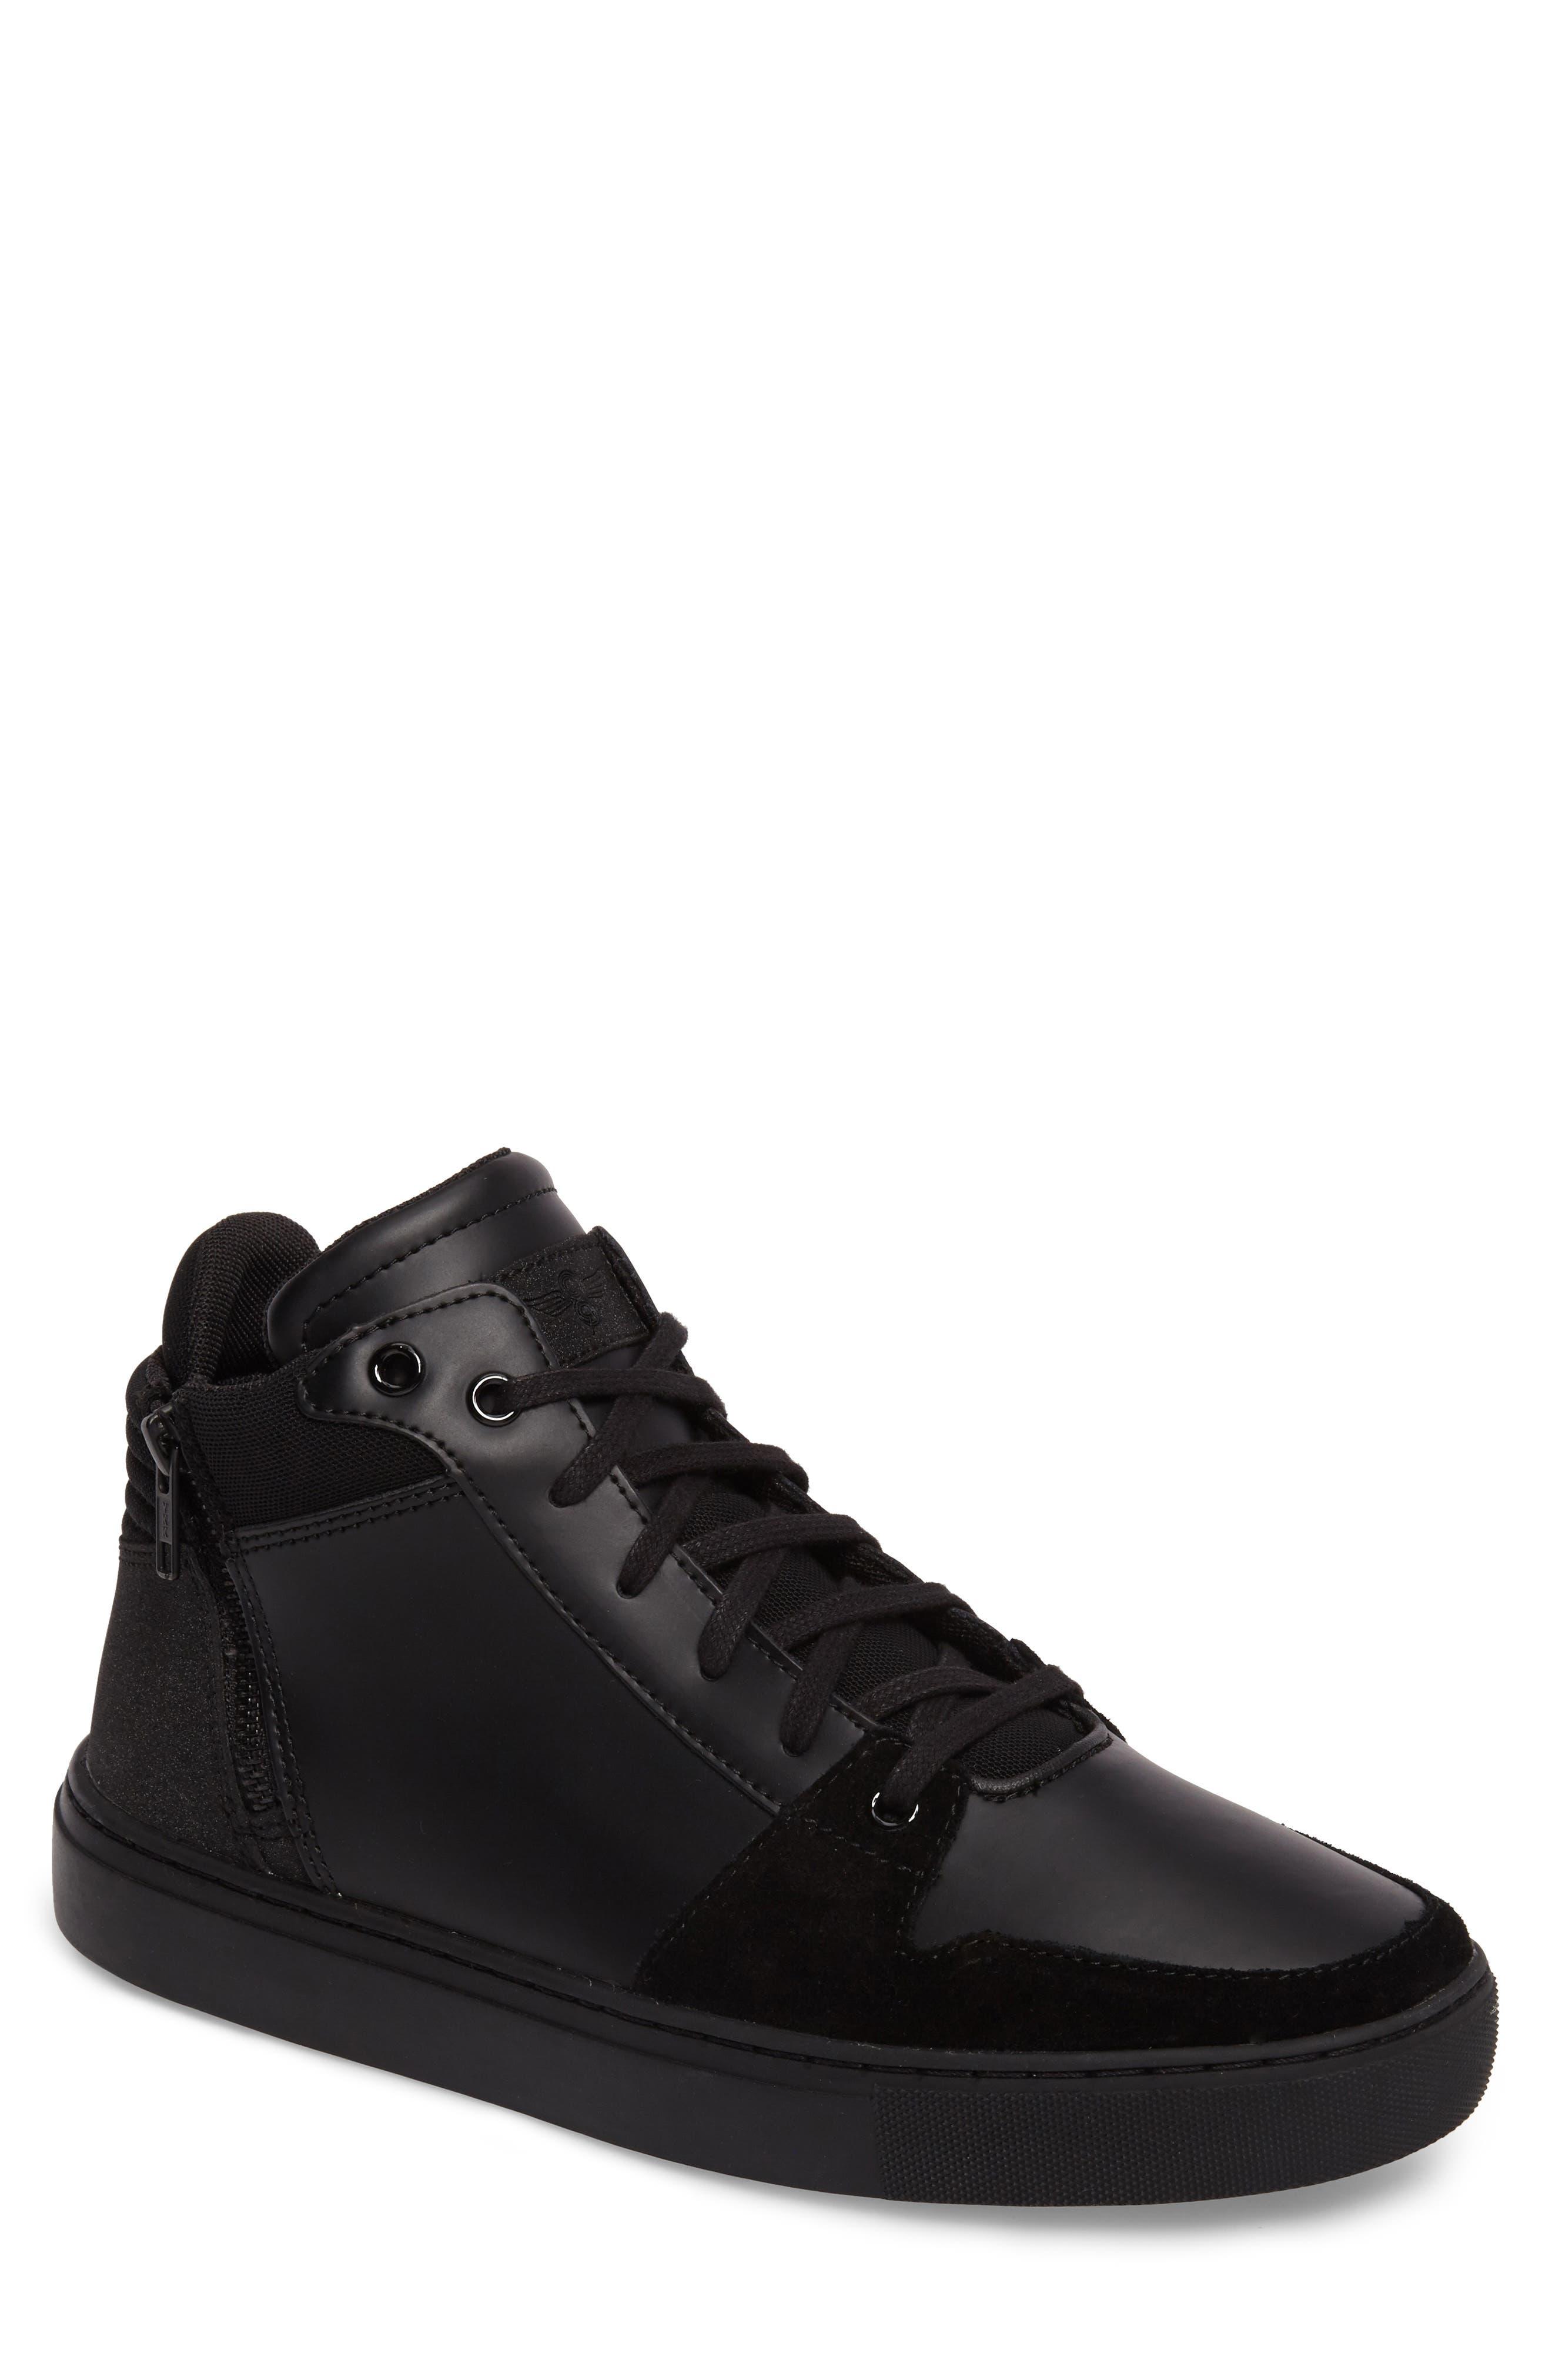 Modena Sneaker,                         Main,                         color, Black Tech